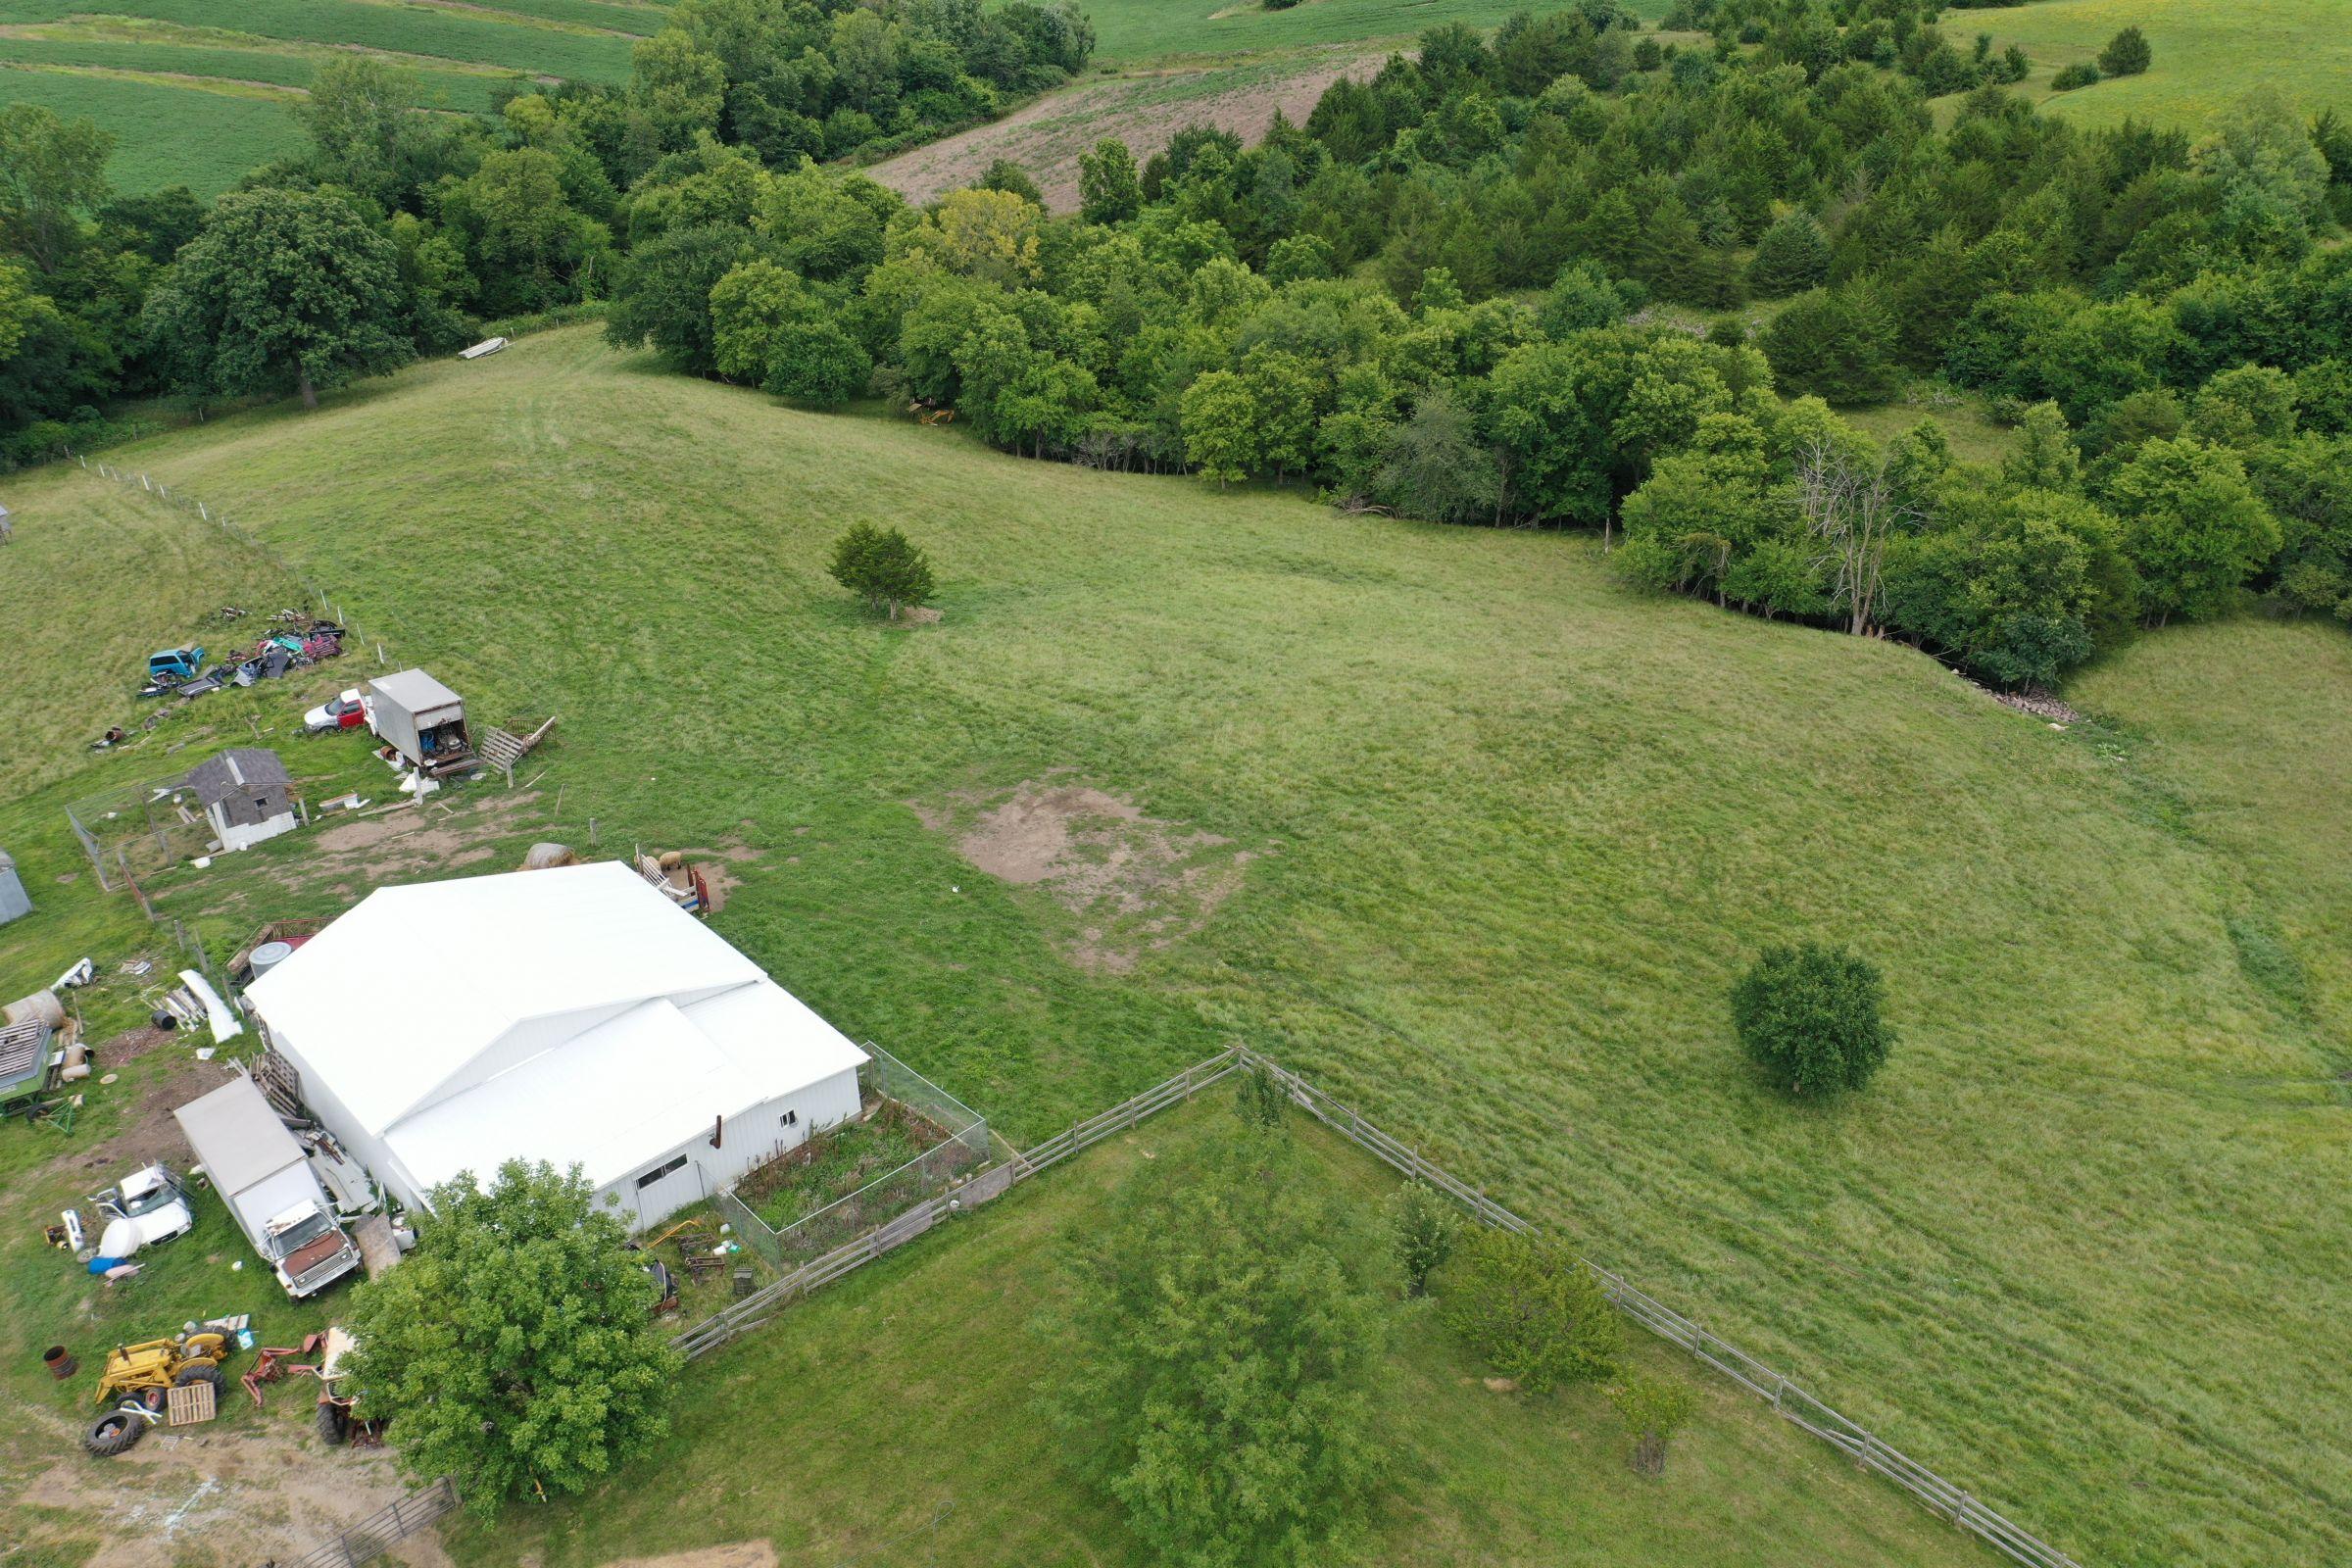 residential-warren-county-iowa-12-acres-listing-number-15104-4-2020-08-08-184619.jpg